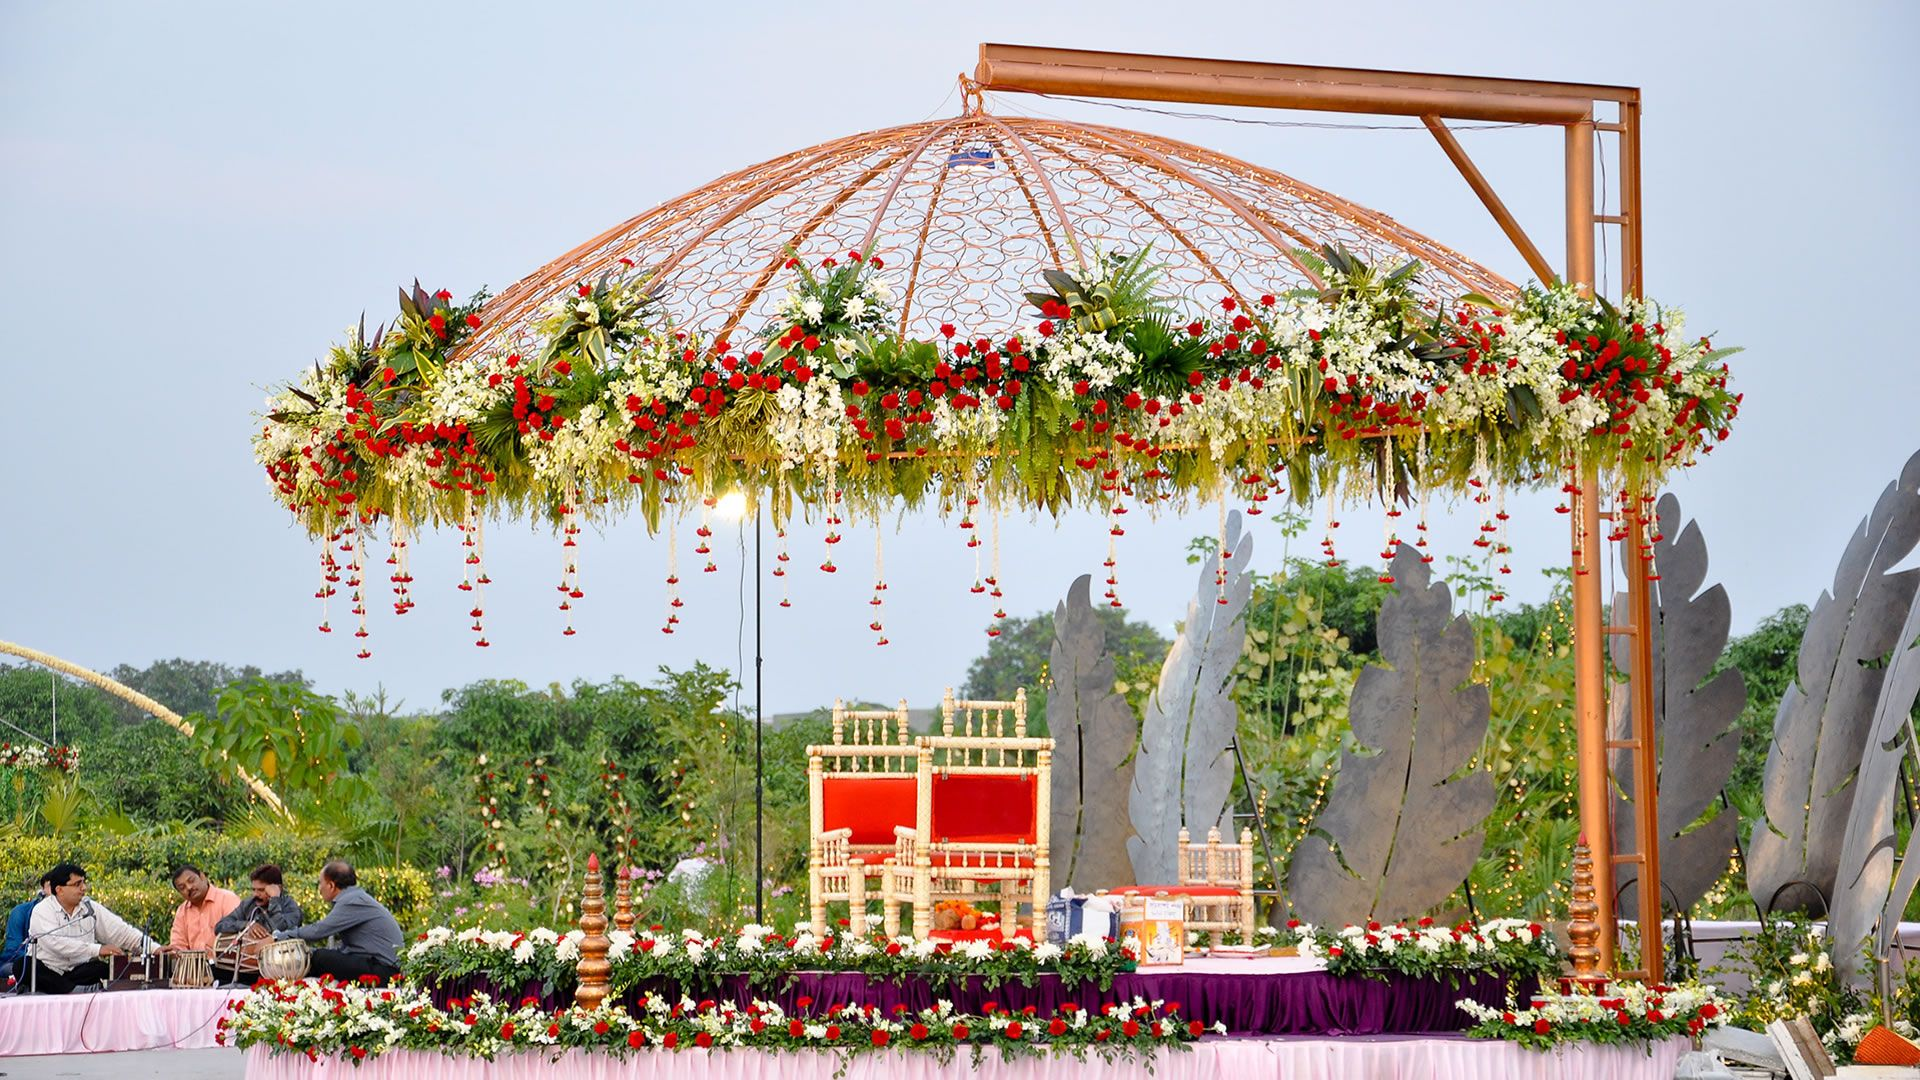 Candid wedding photographer in bhubaneswar wedding photography is candid wedding photographer in bhubaneswar wedding photography is one of the hardest damn jobs in photography auromira weddings offers best wedding junglespirit Choice Image